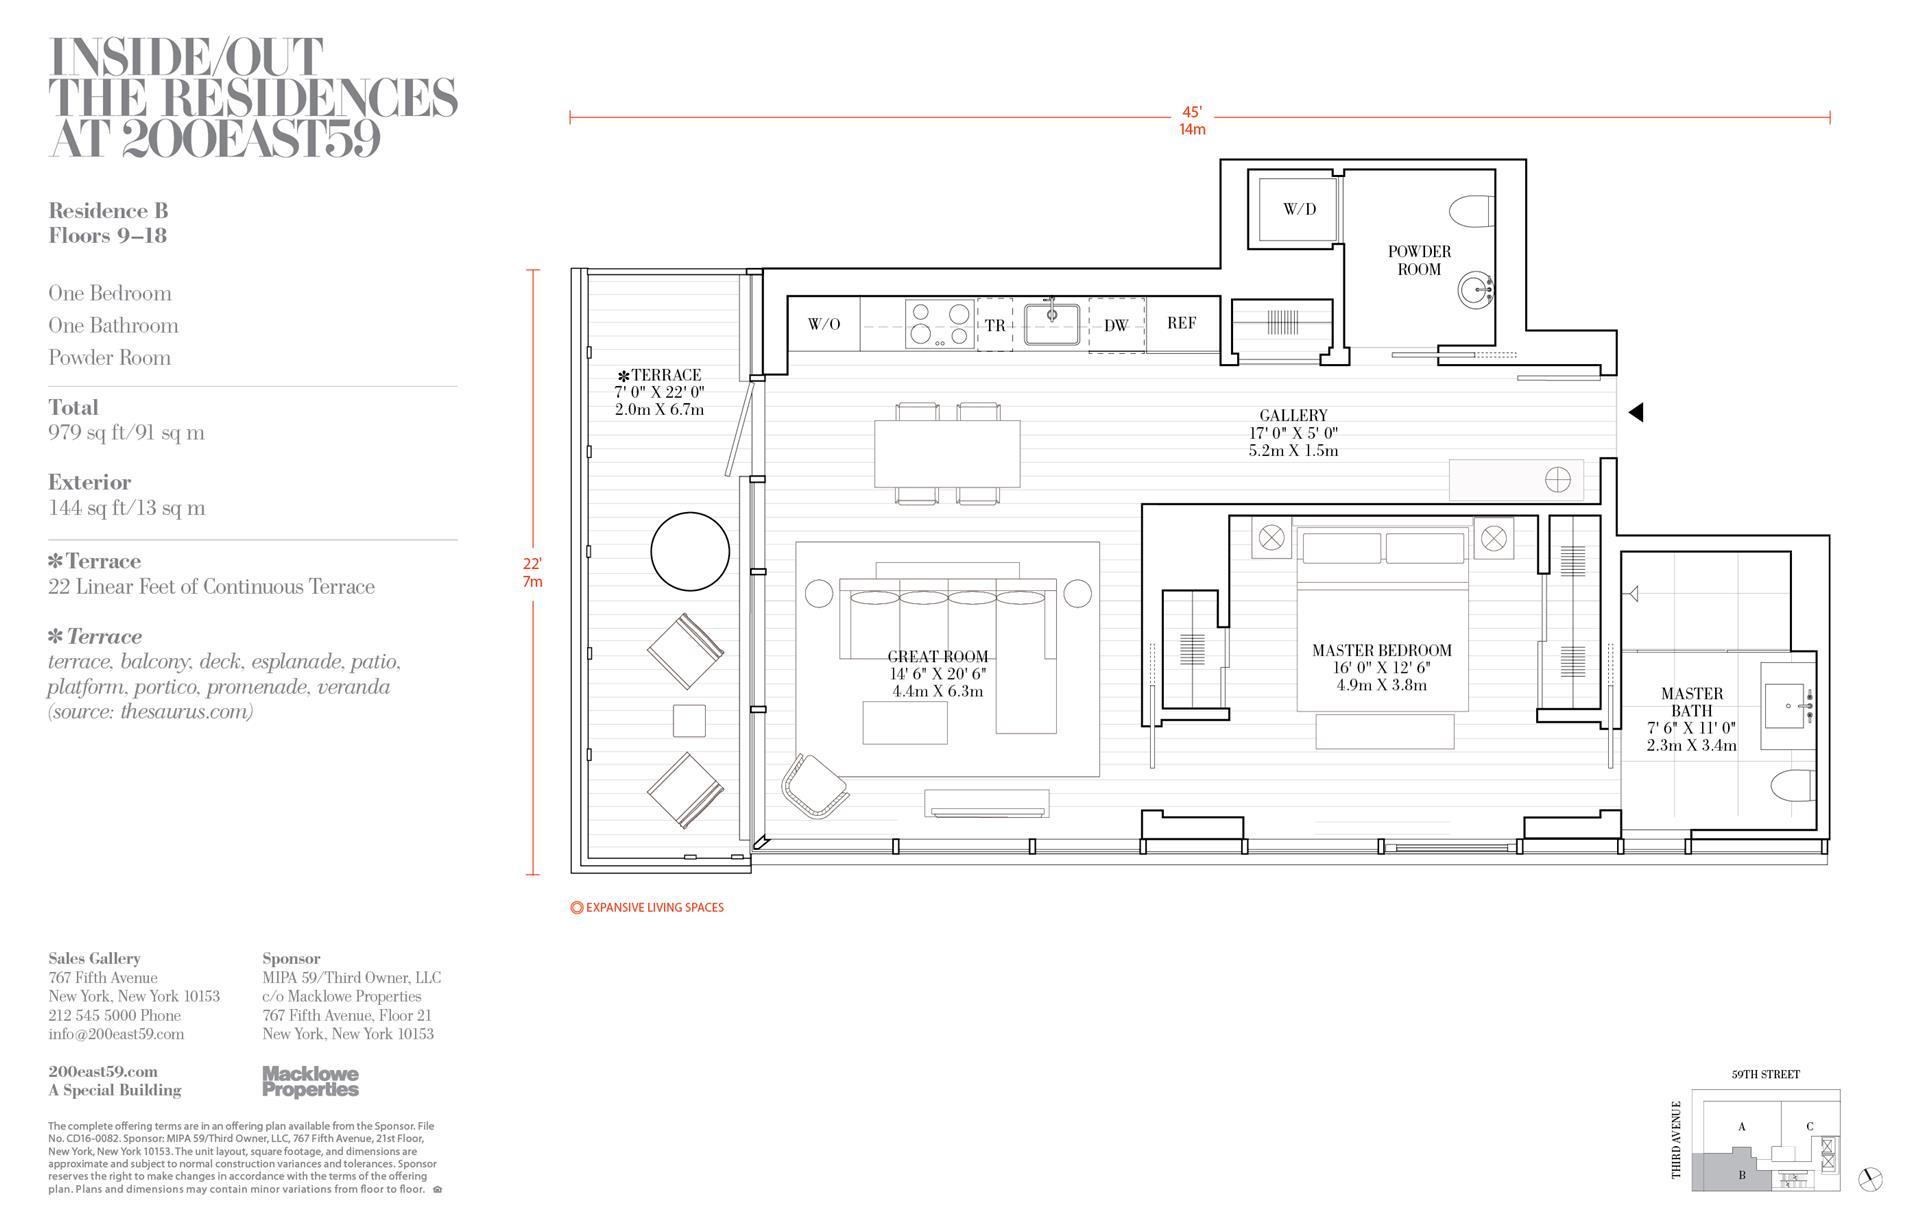 Floor plan of 200 East 59th St, 12B - Midtown, New York